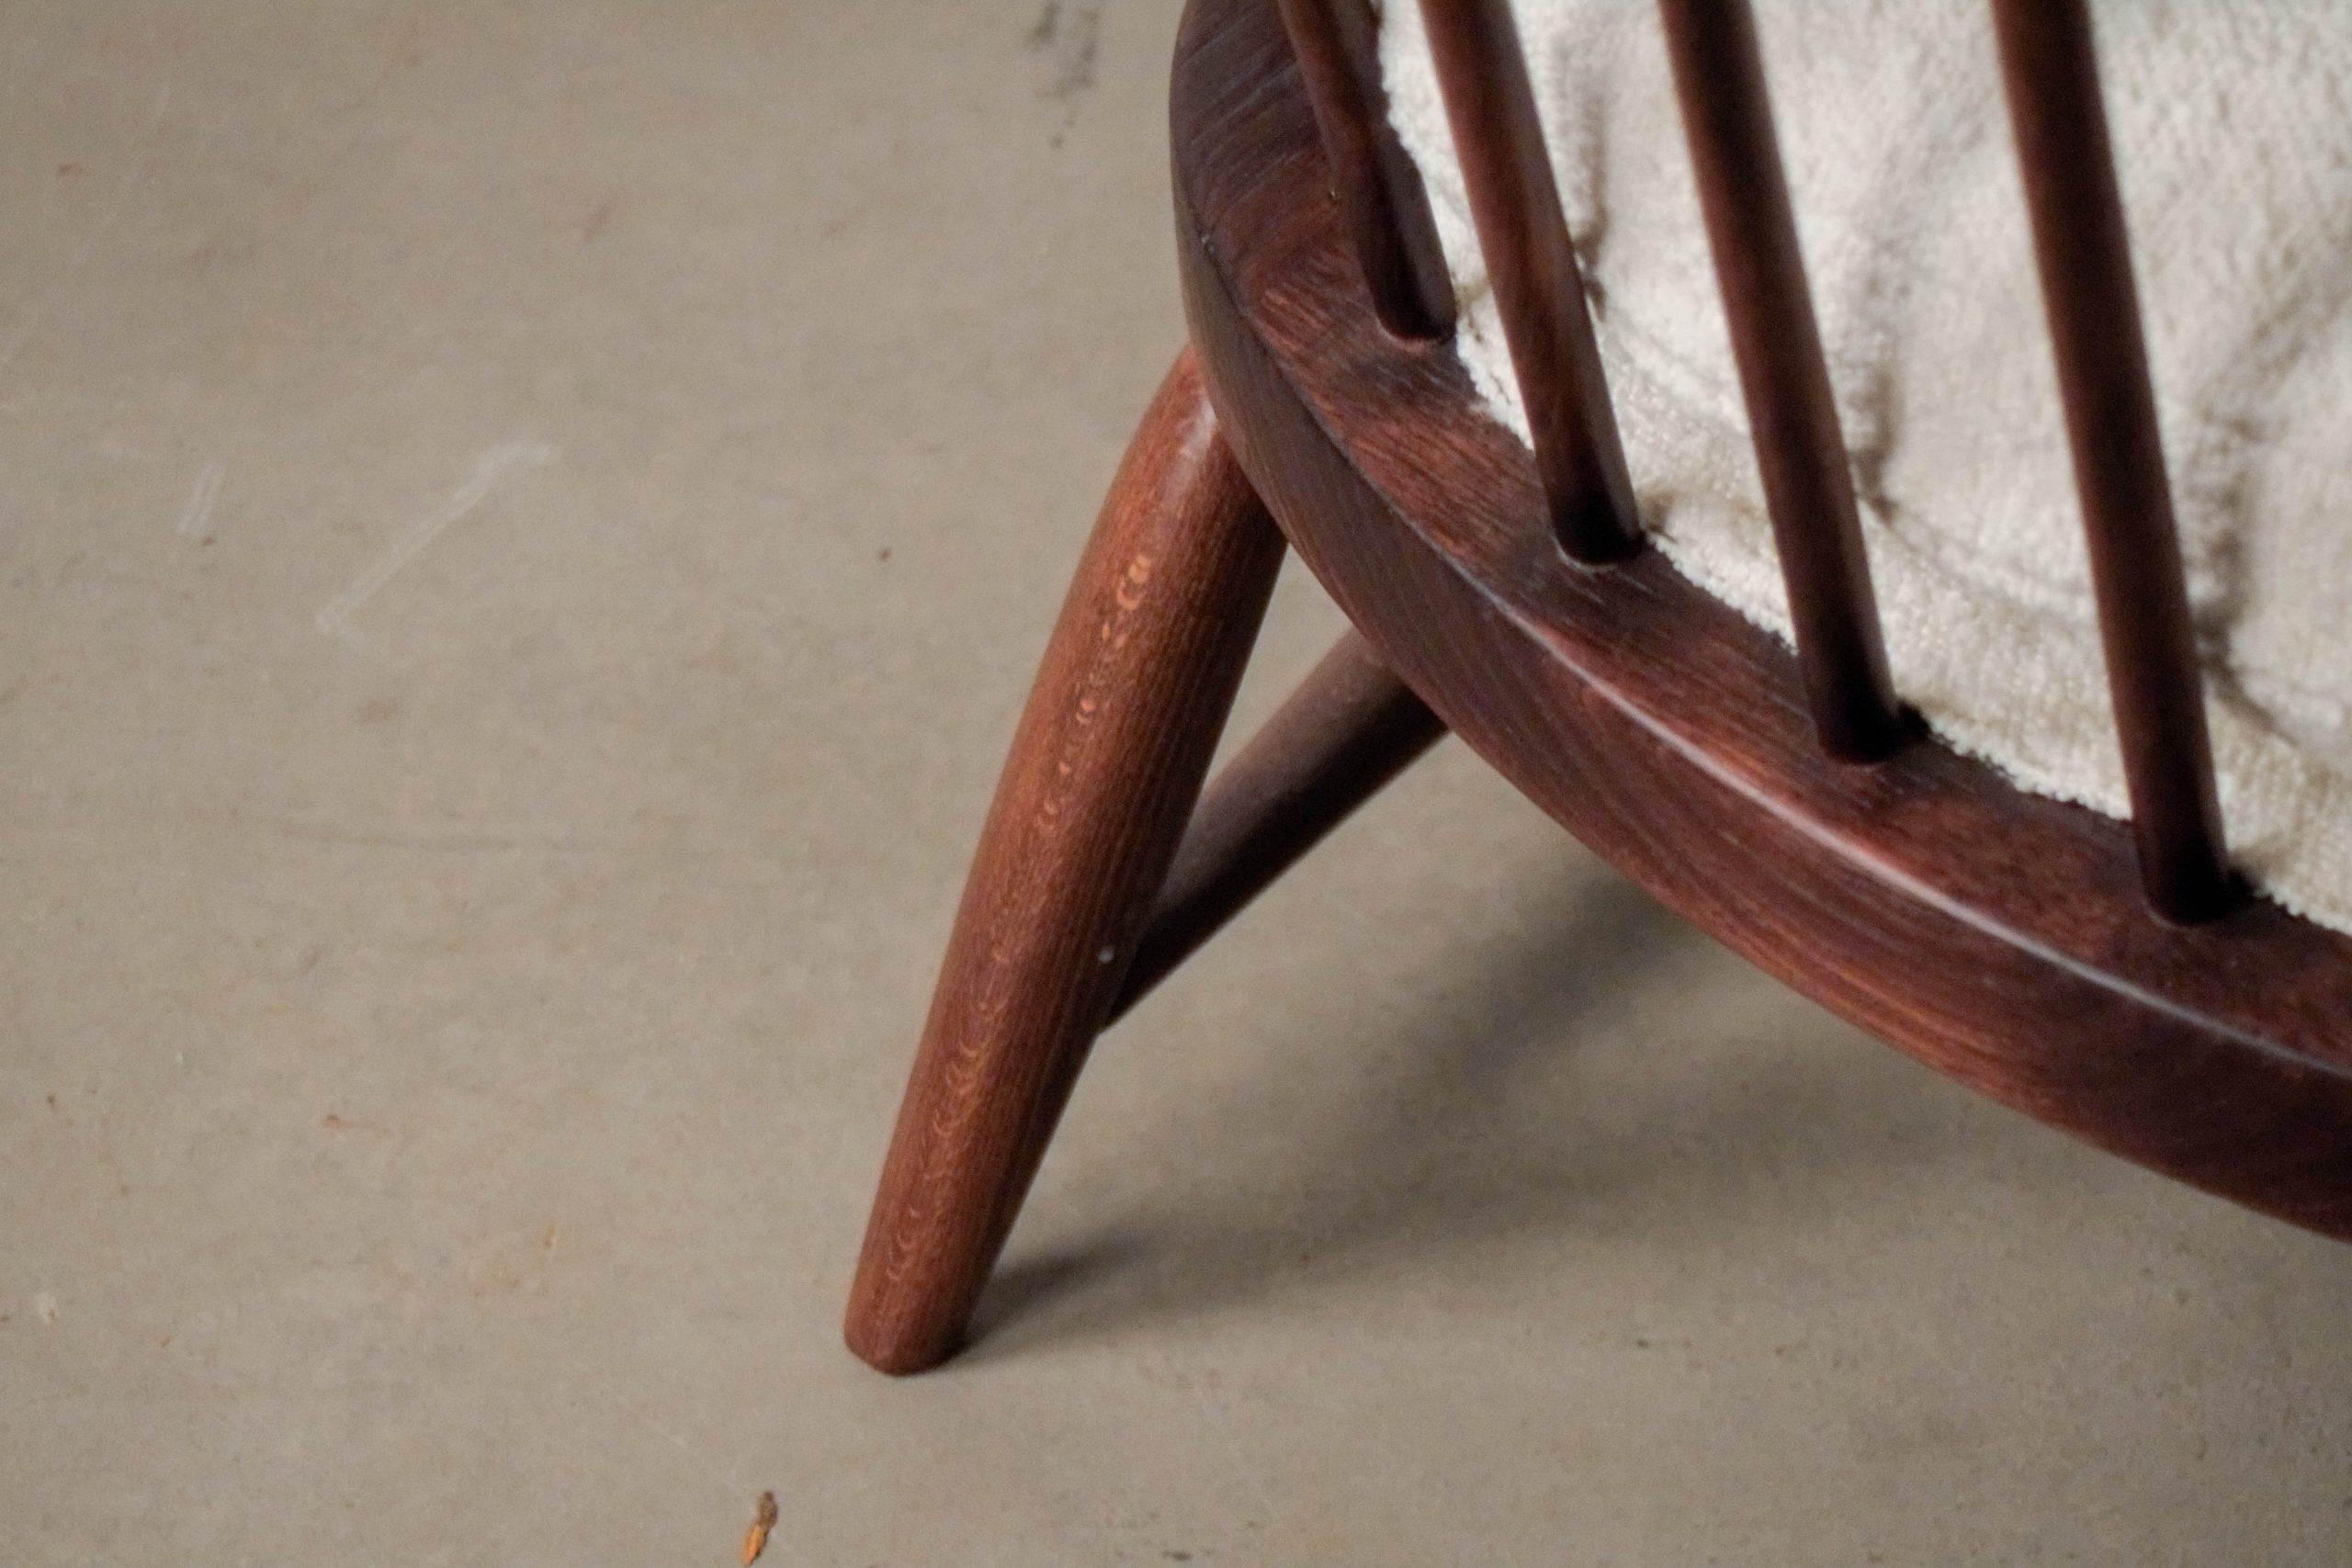 detalle de madera torneada calidad butaca comoda